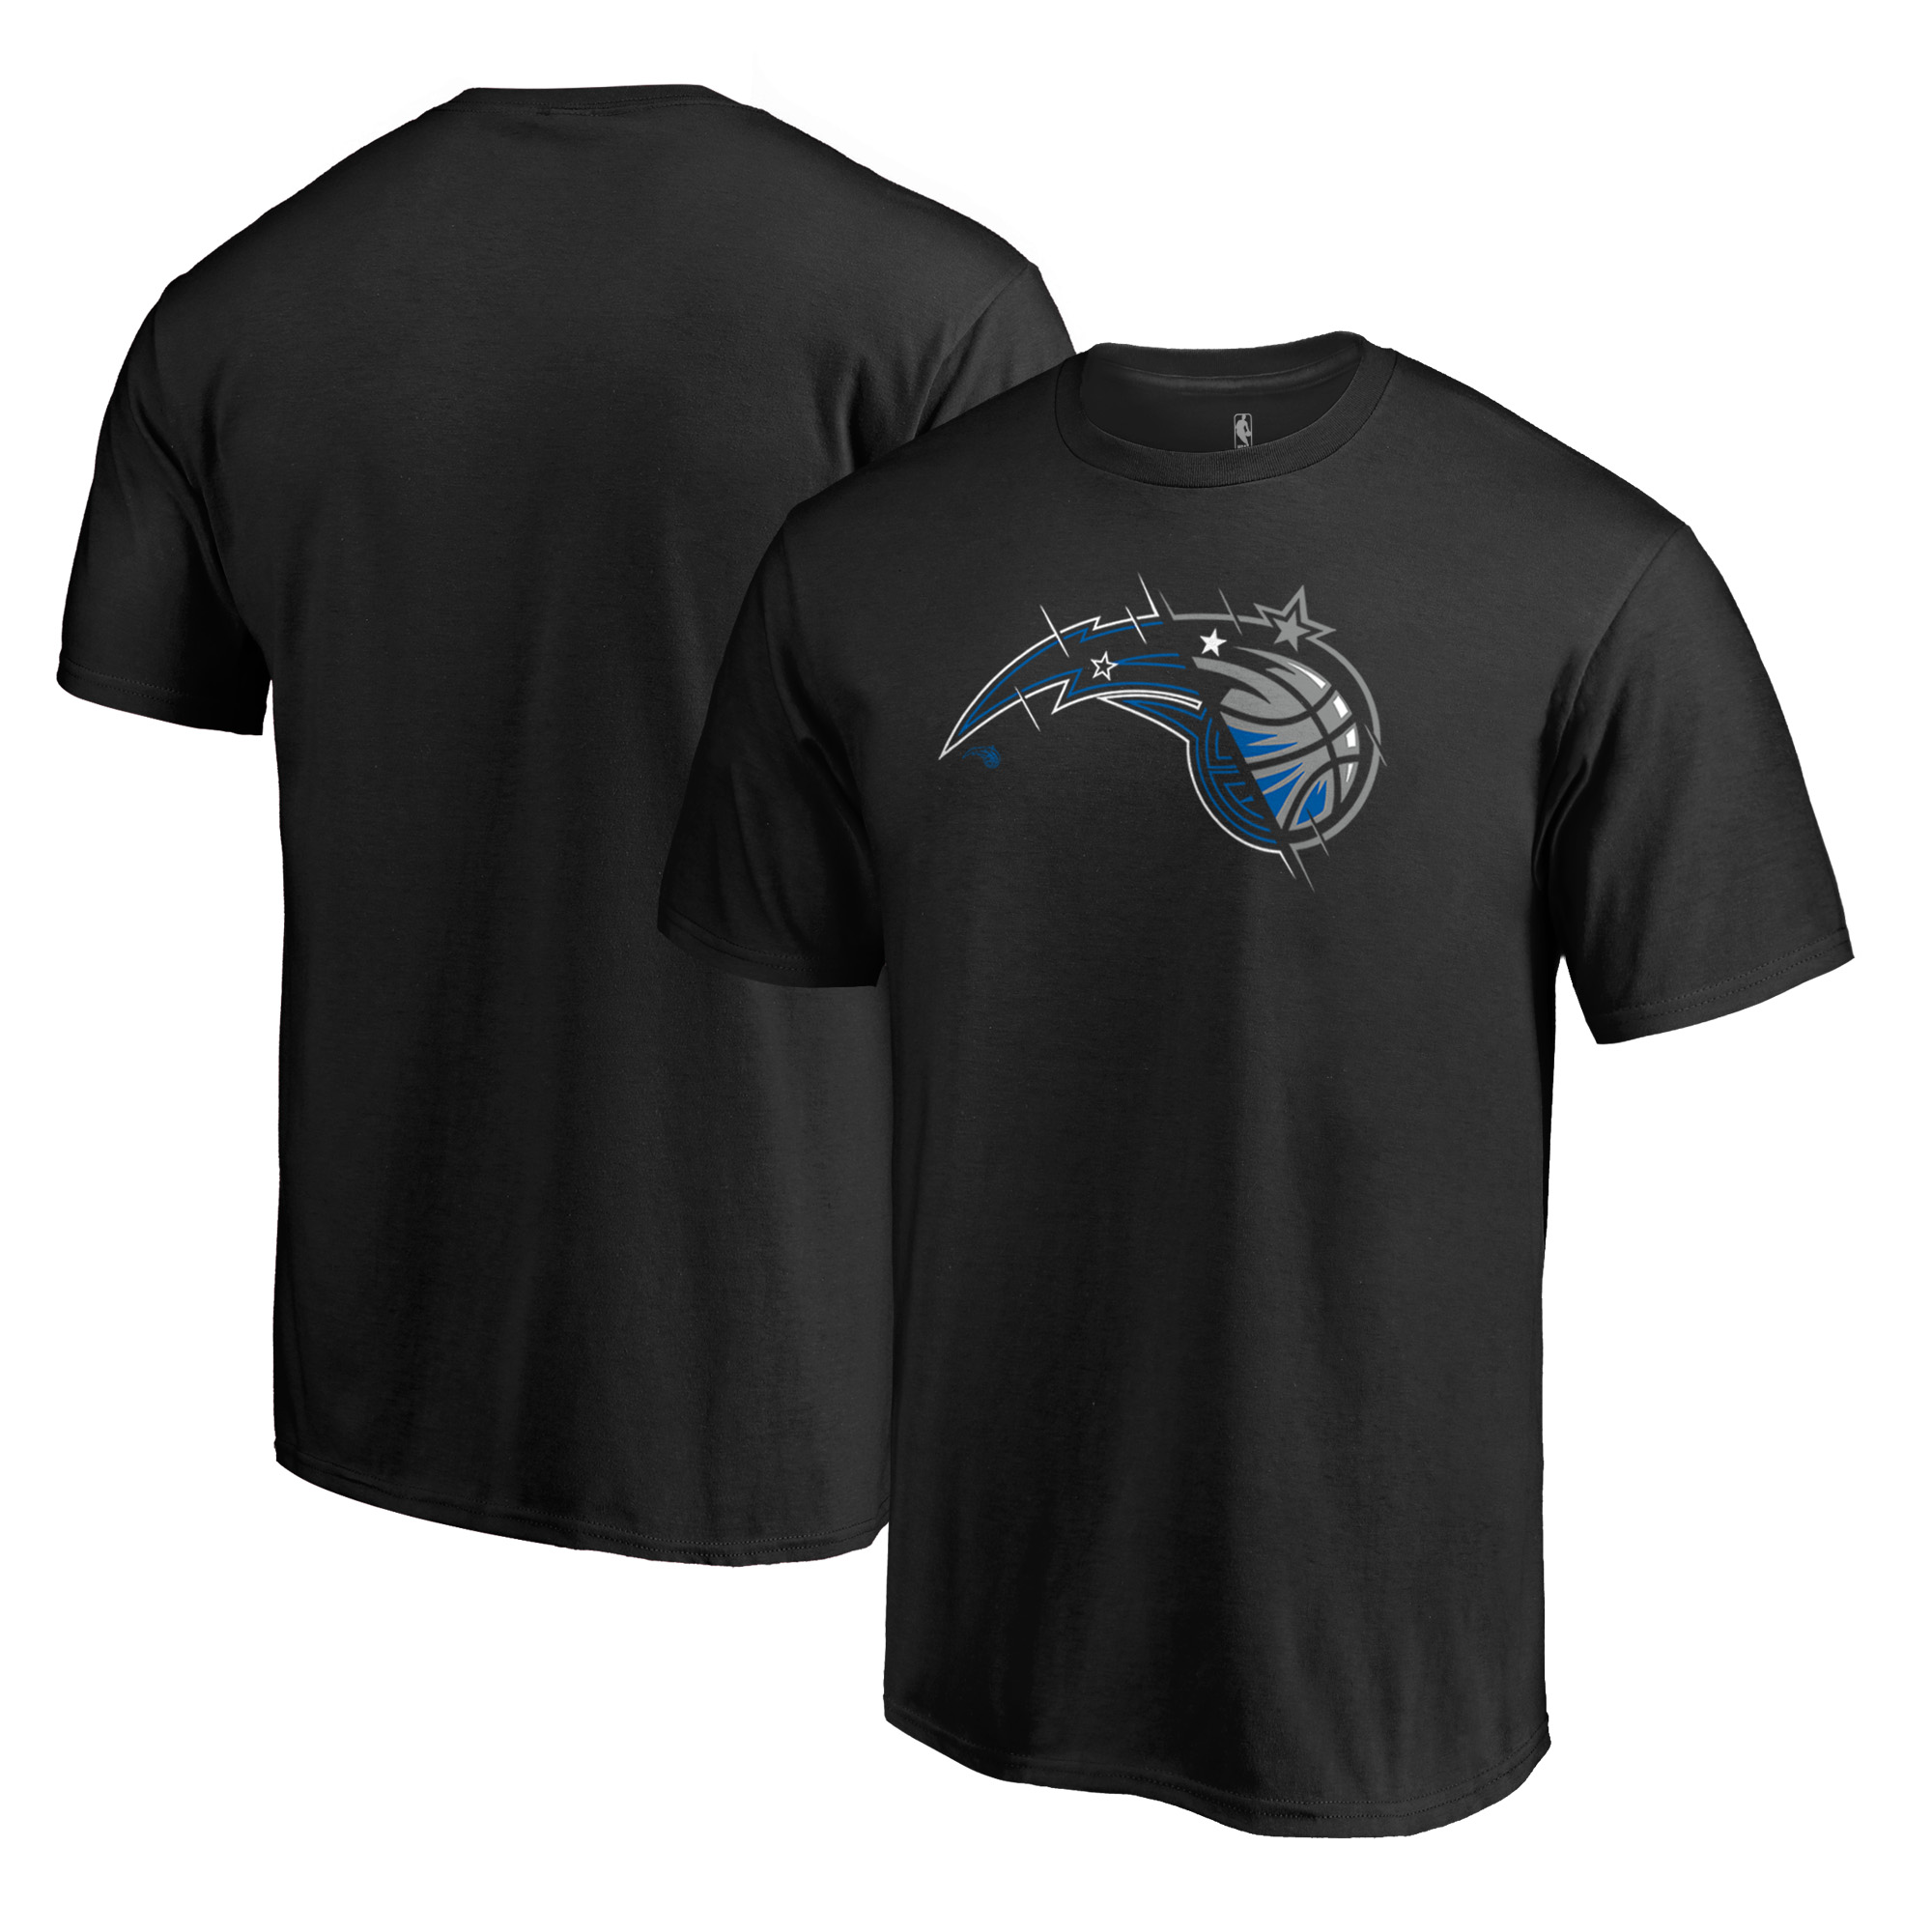 Orlando Magic Fanatics Branded X-Ray T-Shirt - Black